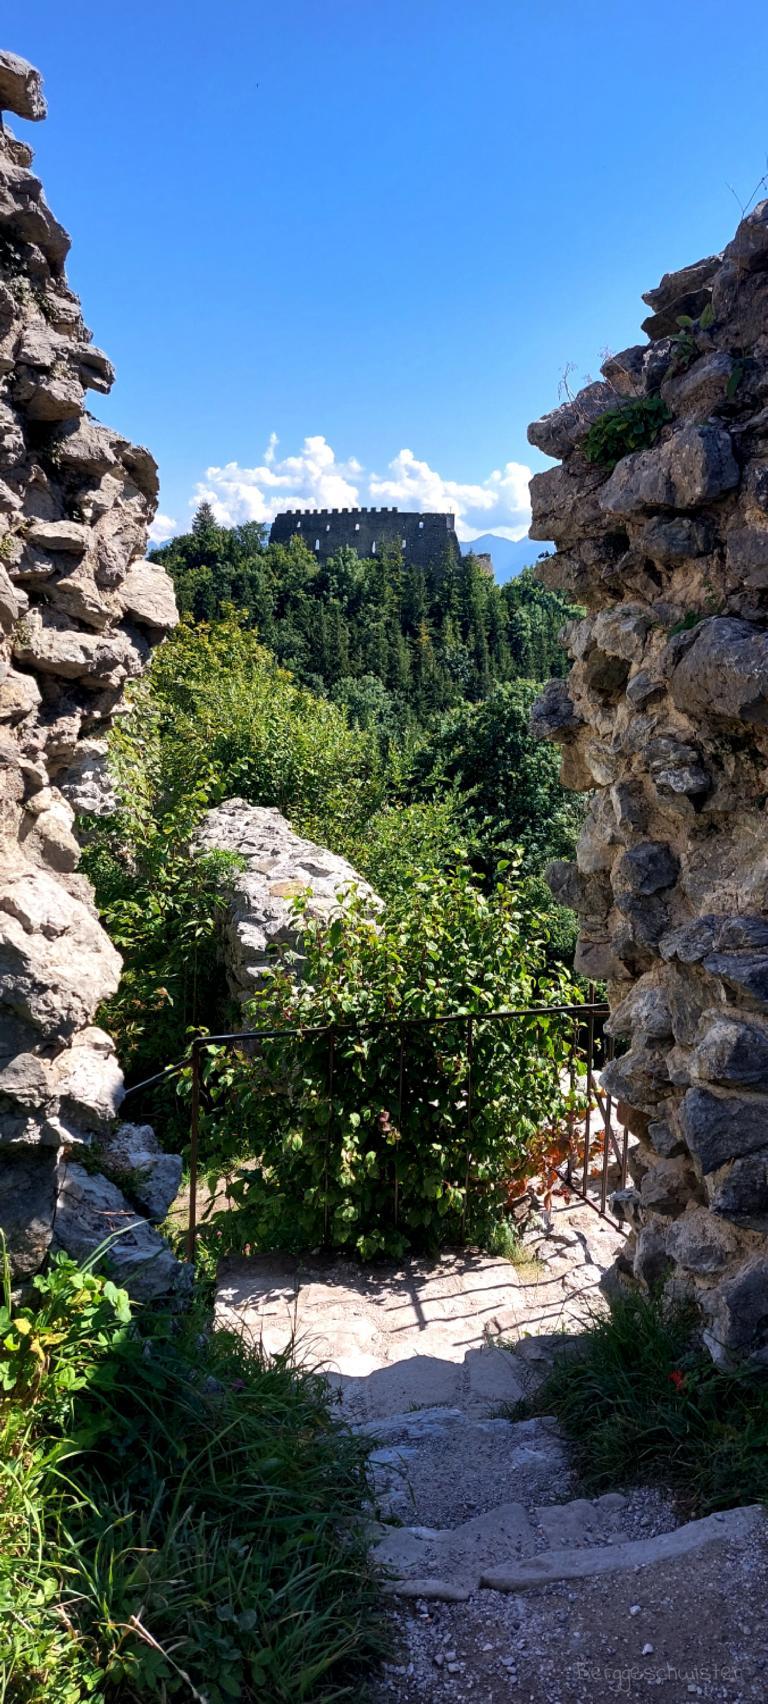 Burgruine Hohenfreyberg Wandern mit Kindern im Allgäu Blick auf Burg Eisenberg